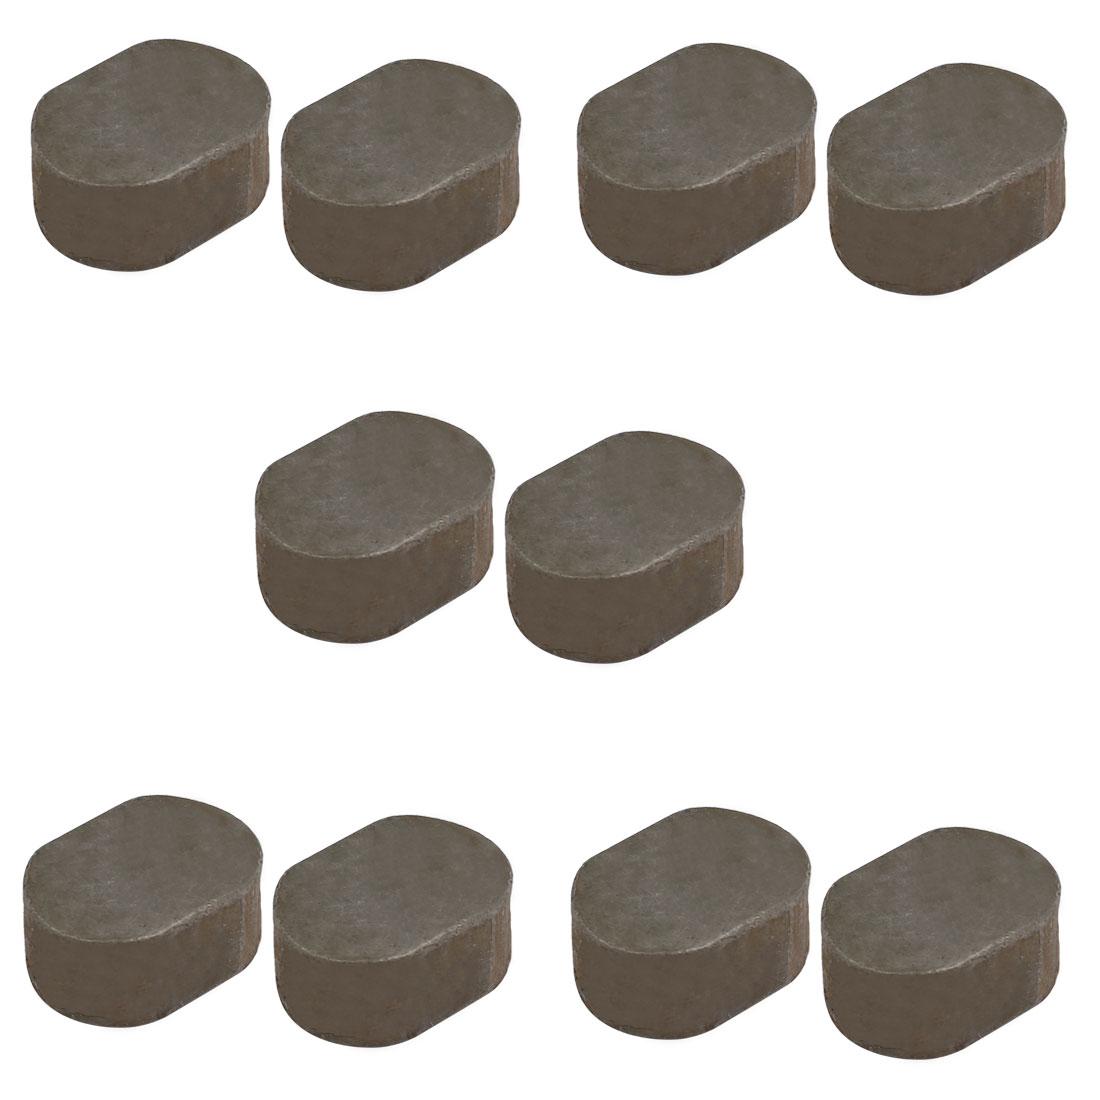 22mmx16mmx10mm Carbon Steel Key Stock To Lock Gears Pulleys 10pcs